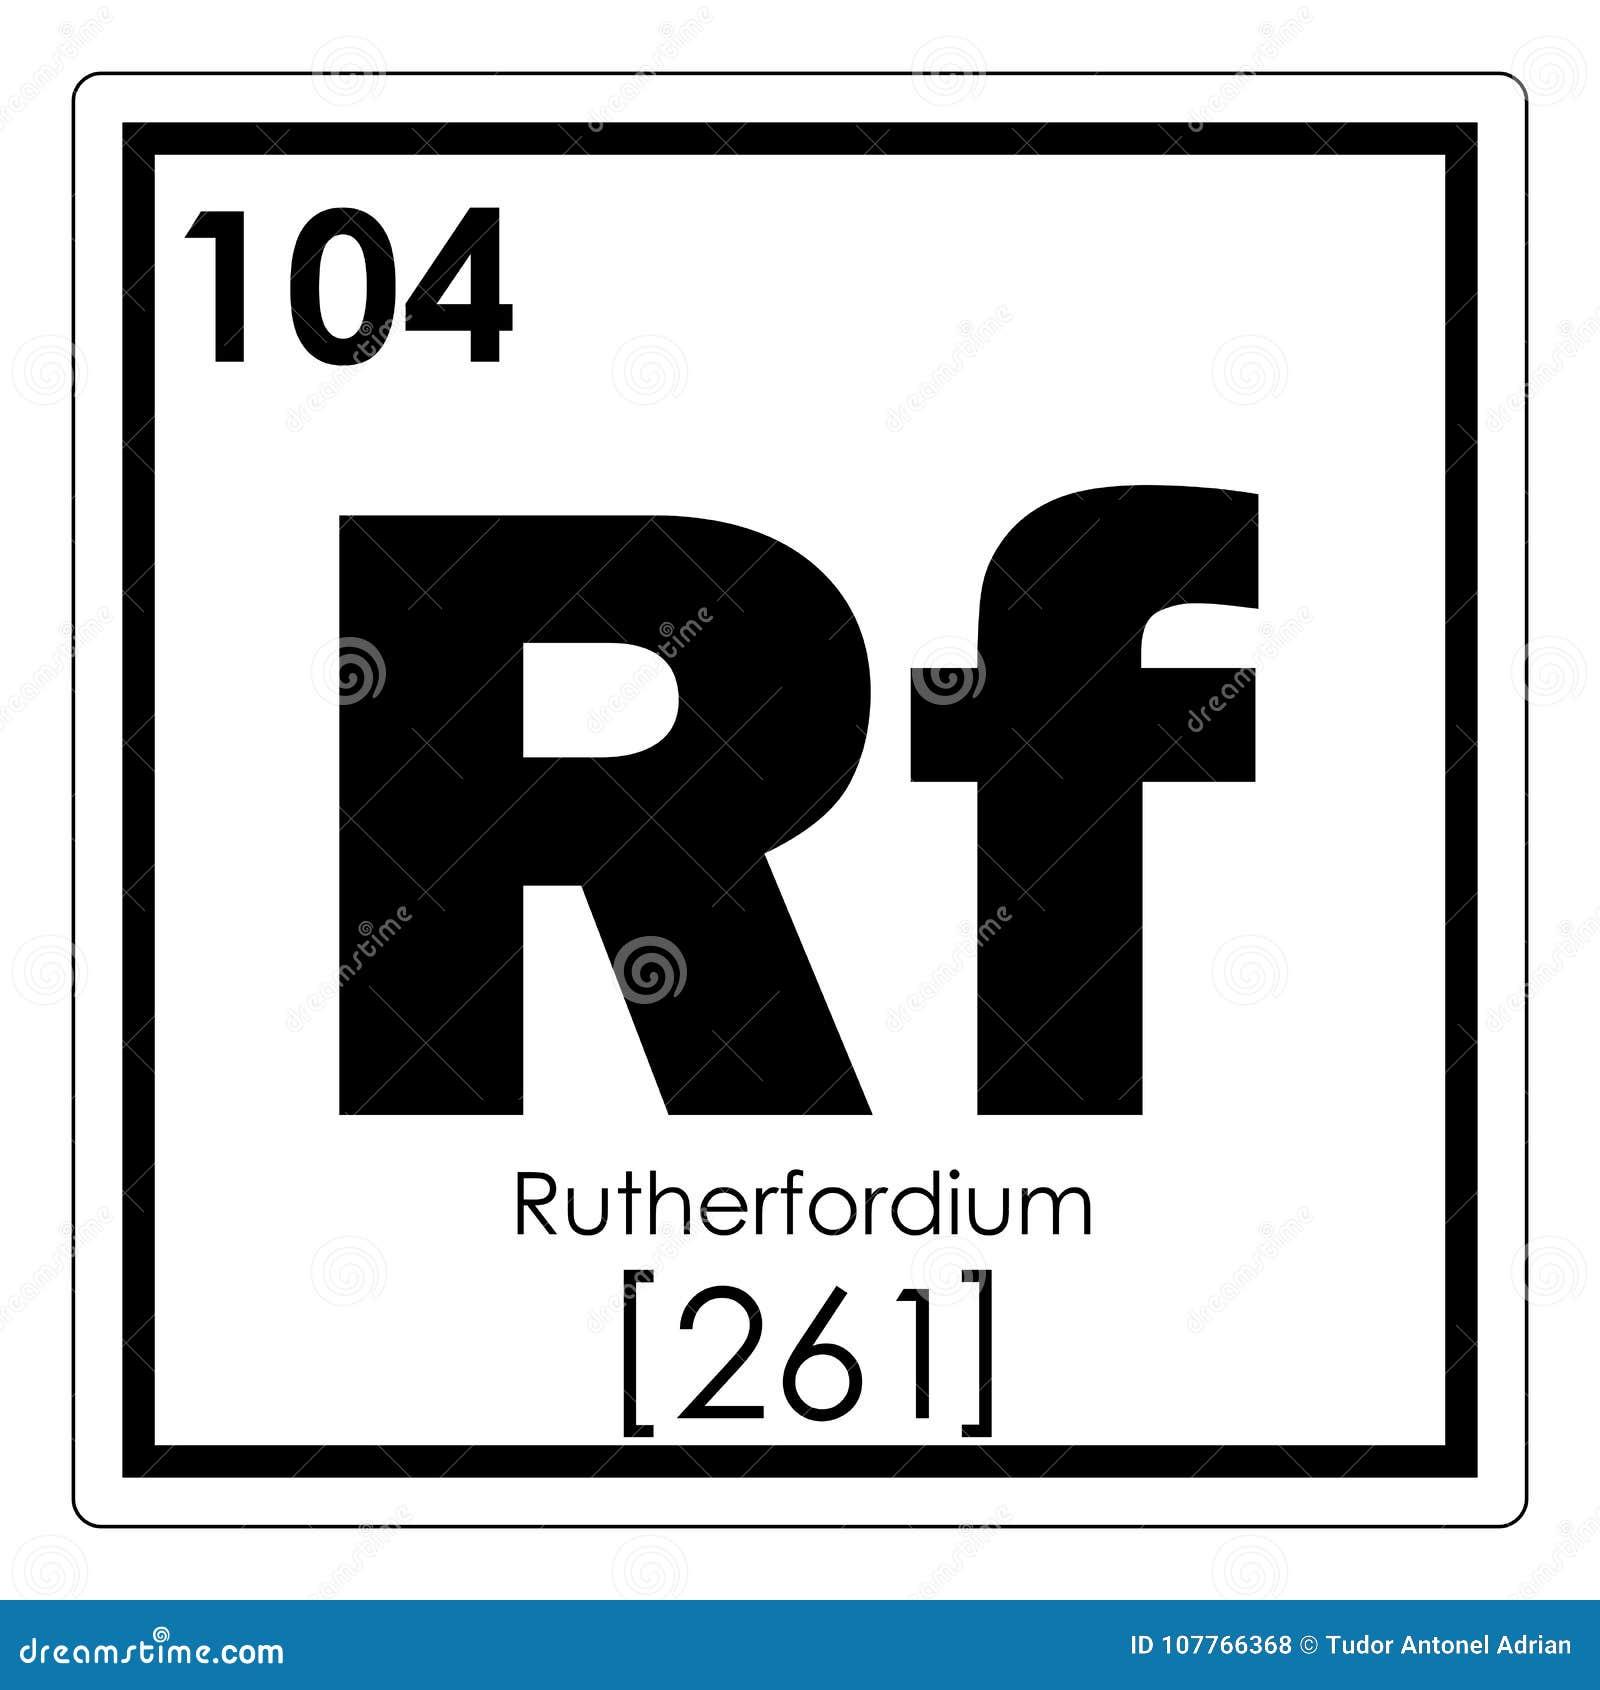 Rutherfordium Chemical Element Stock Illustration Illustration Of